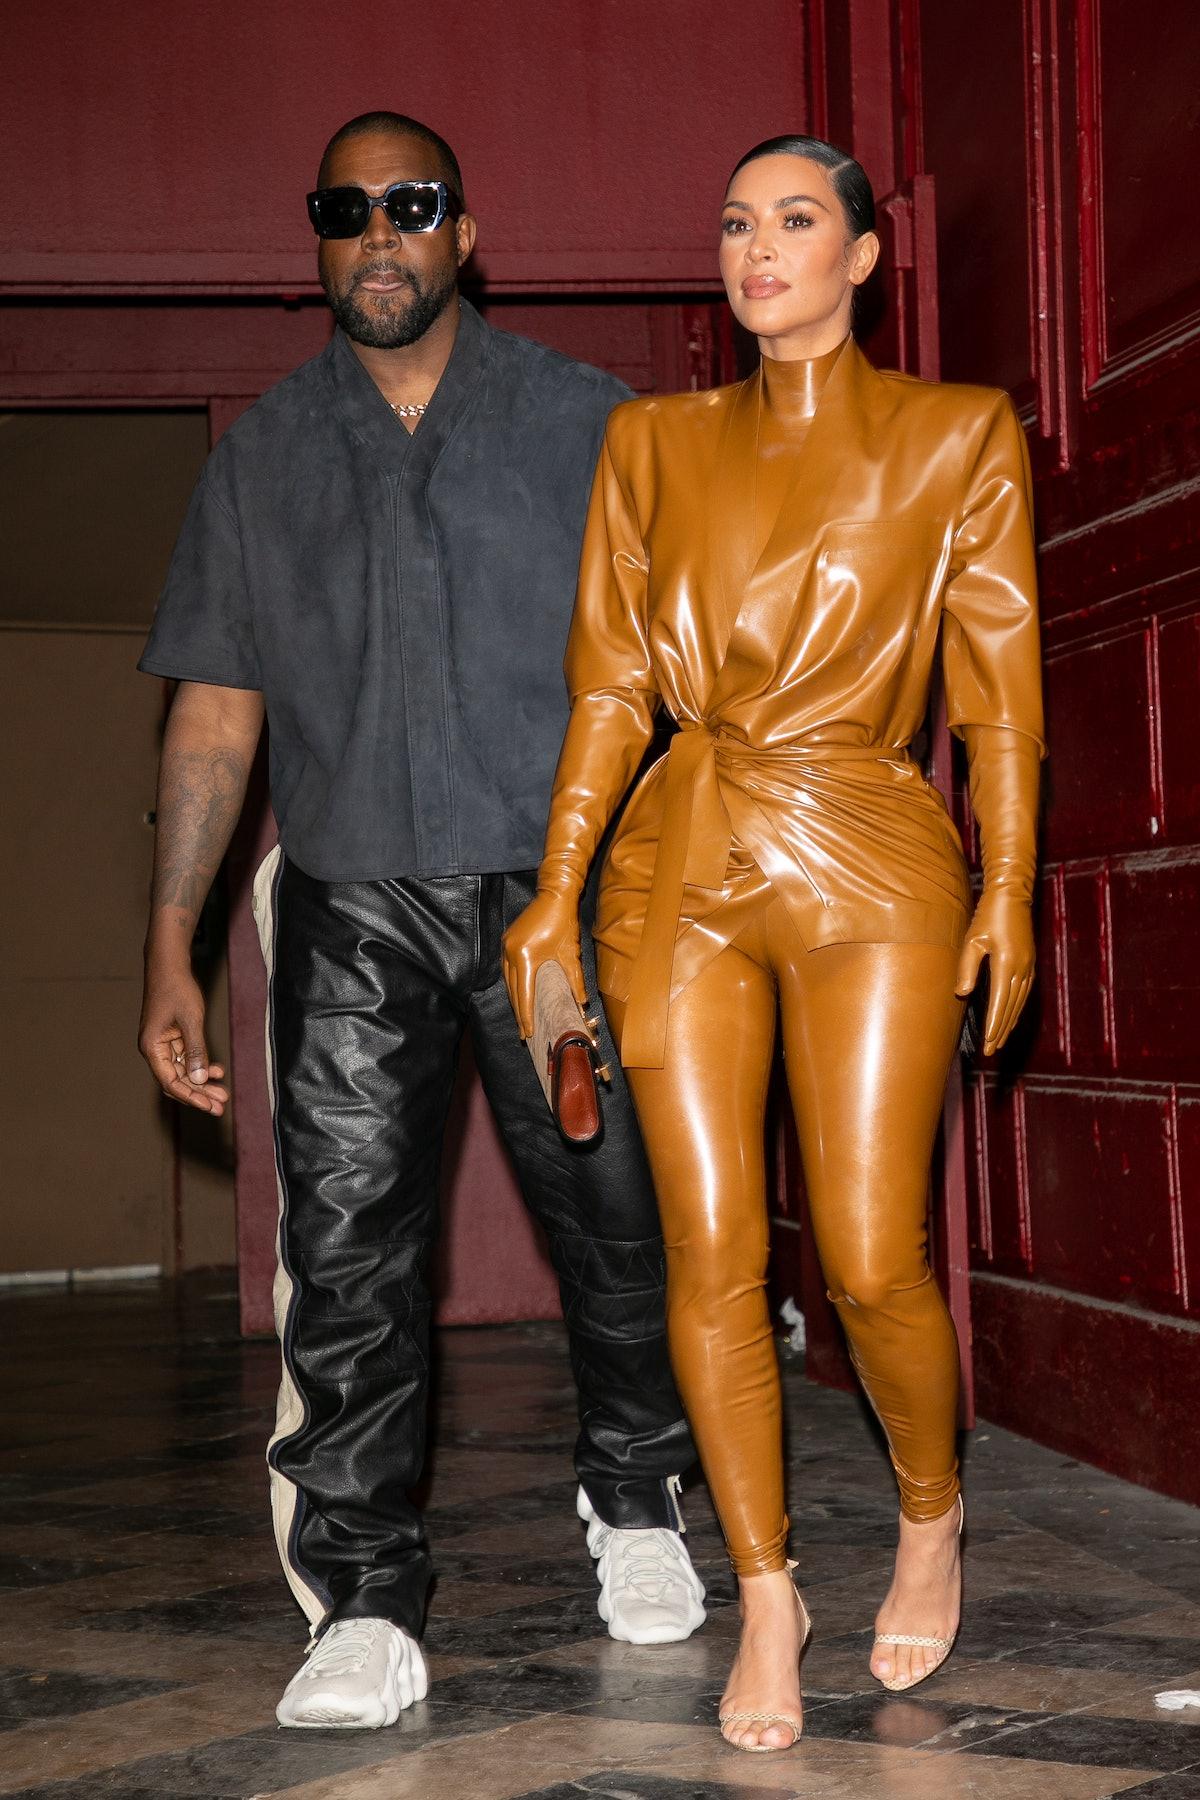 Kim Kardashian and Kanye West recreated their wedding.